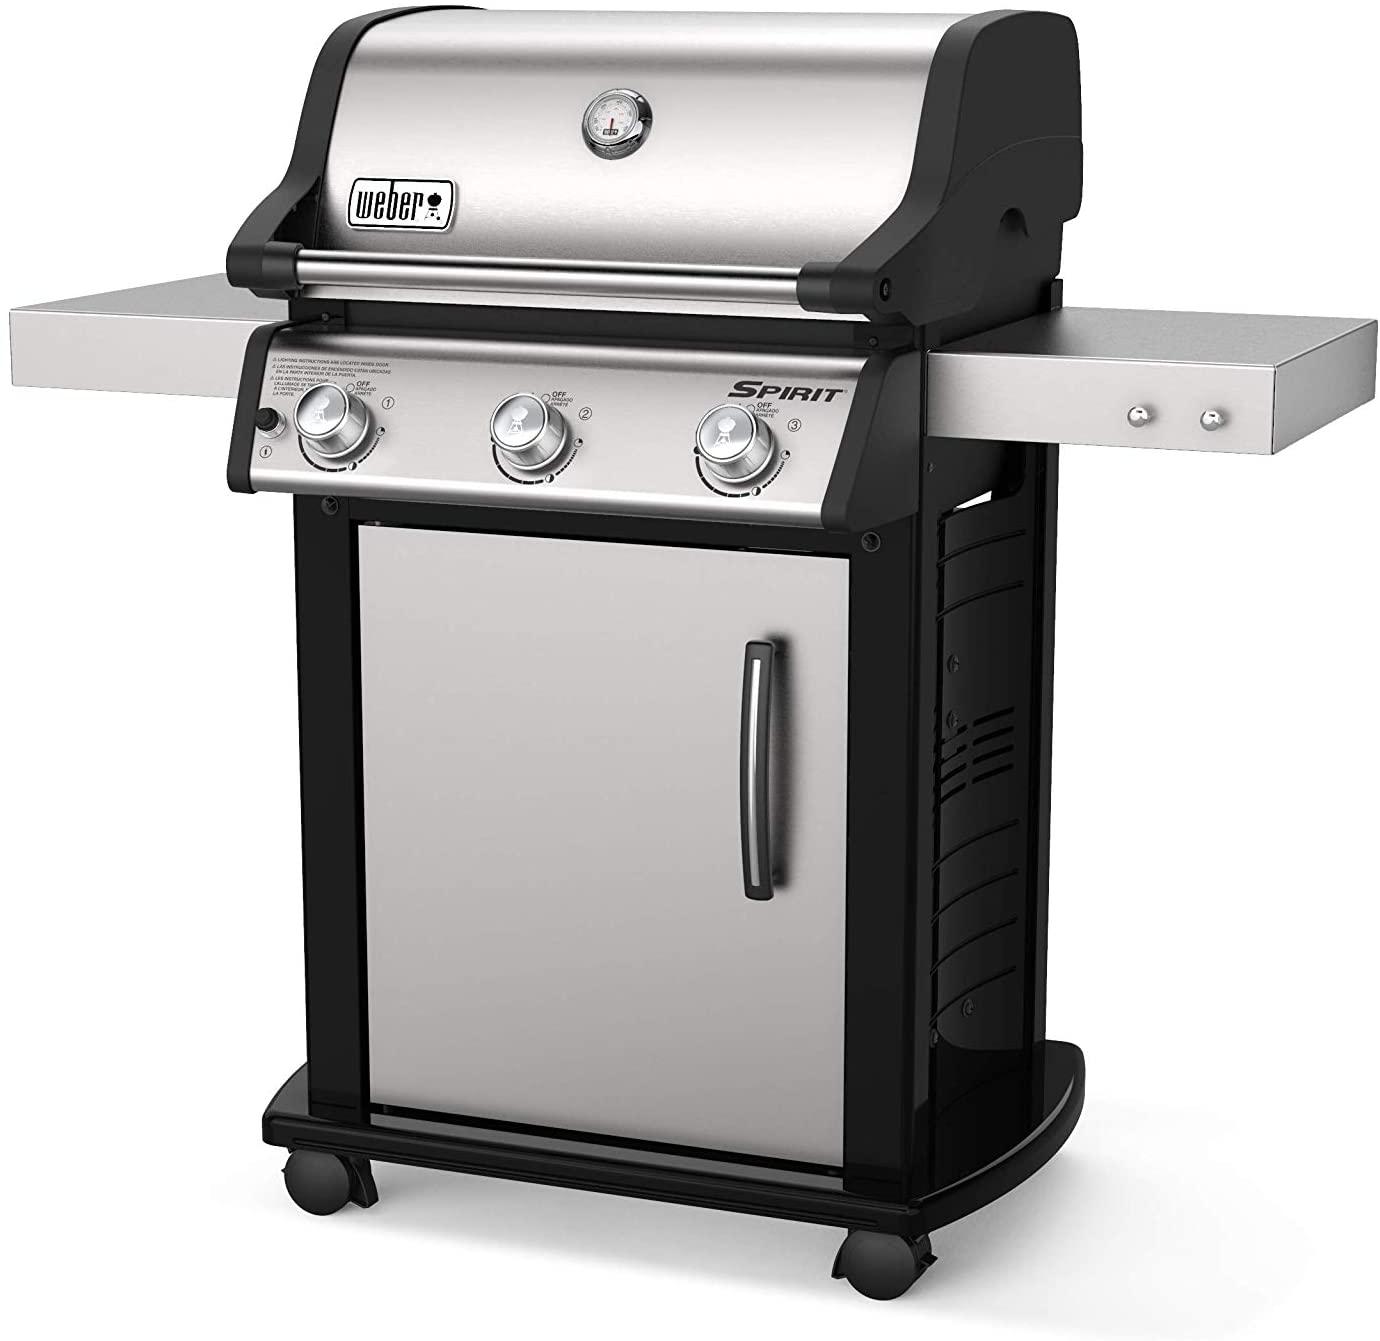 propane gas grills on sale